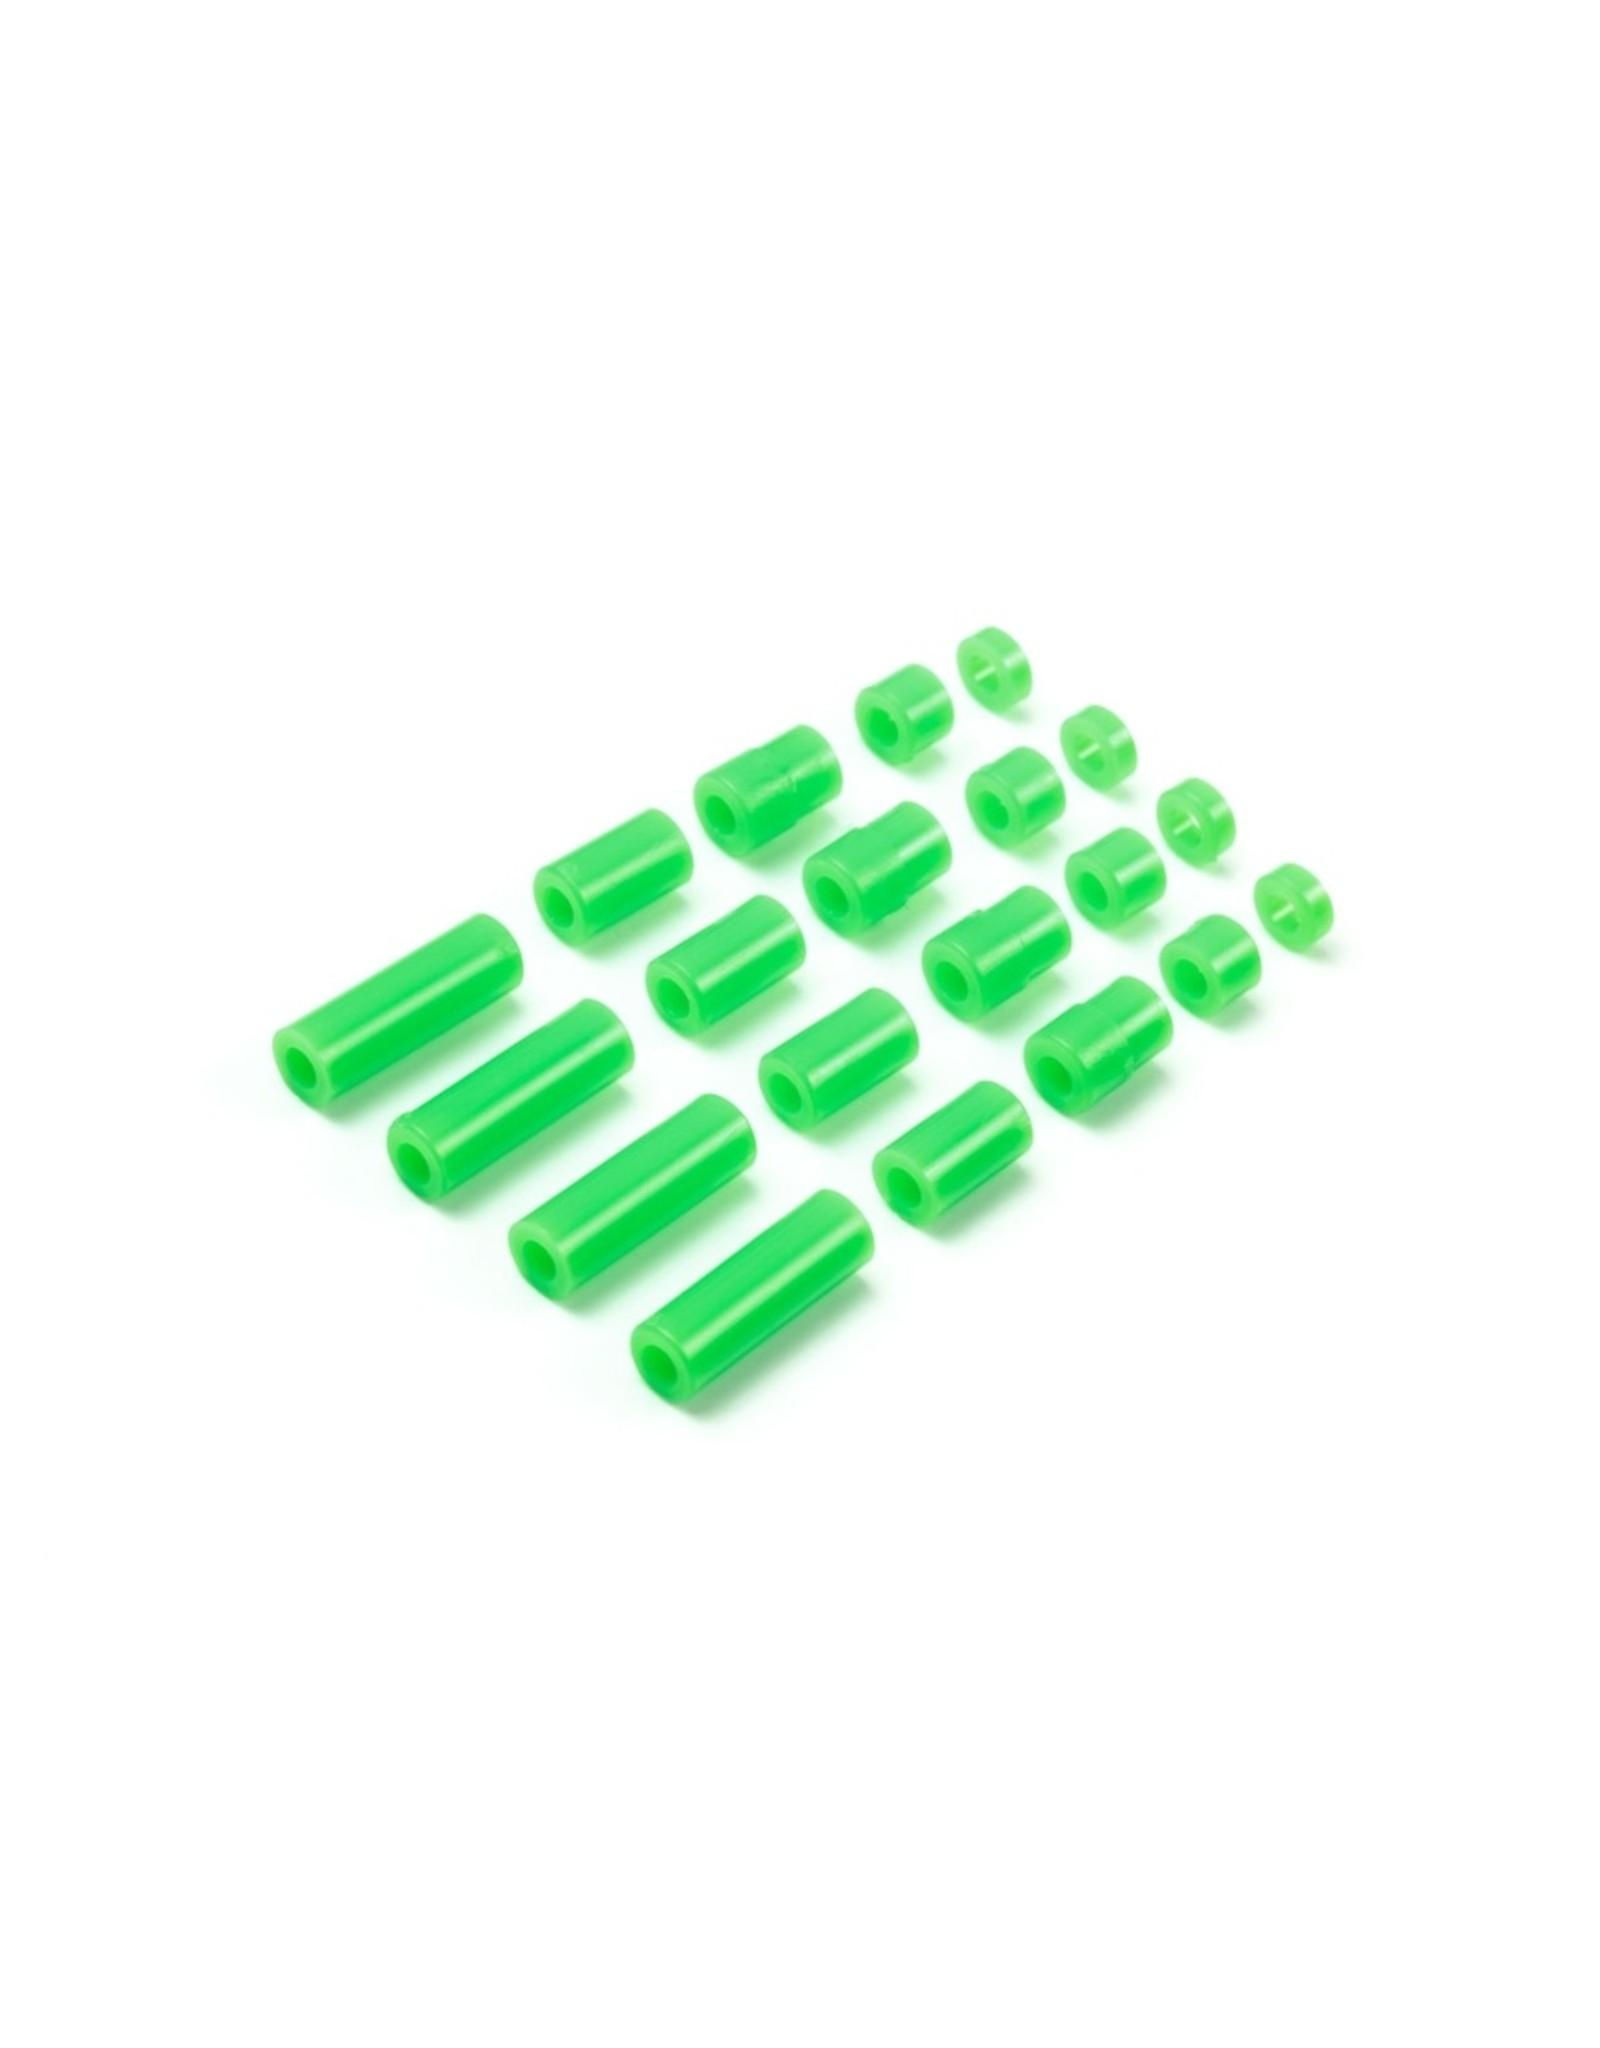 Tamiya JR LW Plastic Spacer Set - 12/6.7/6/3/1.5mm (Green)  (TAM95443)